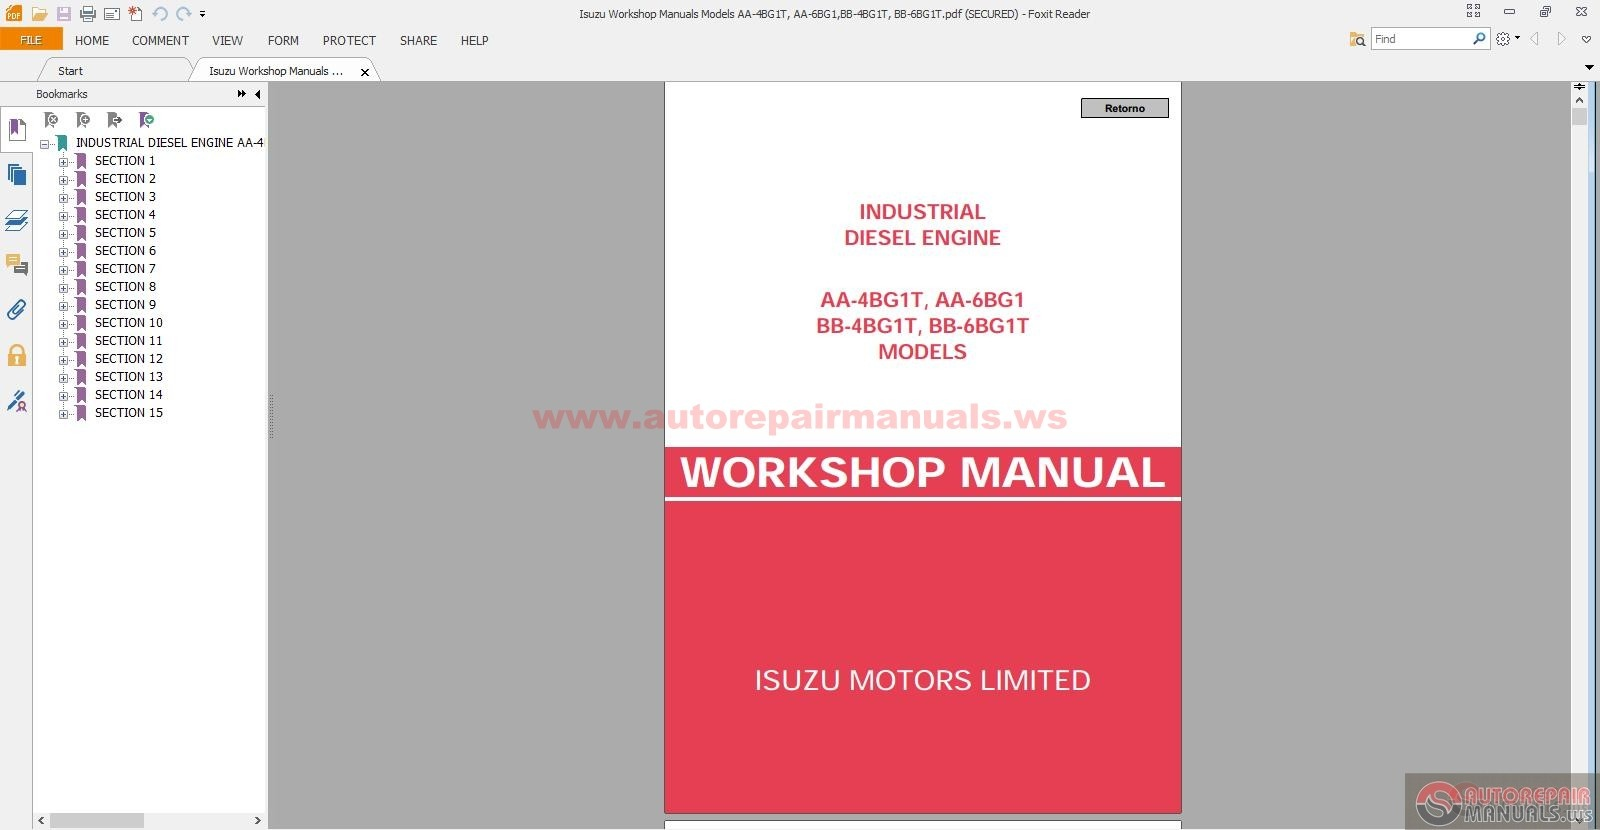 keygen autorepairmanuals ws isuzu workshop manuals models aa 4bg1t rh keygensarm blogspot com 6BD1T Isuzu Engine Isuzu Diesel Engines